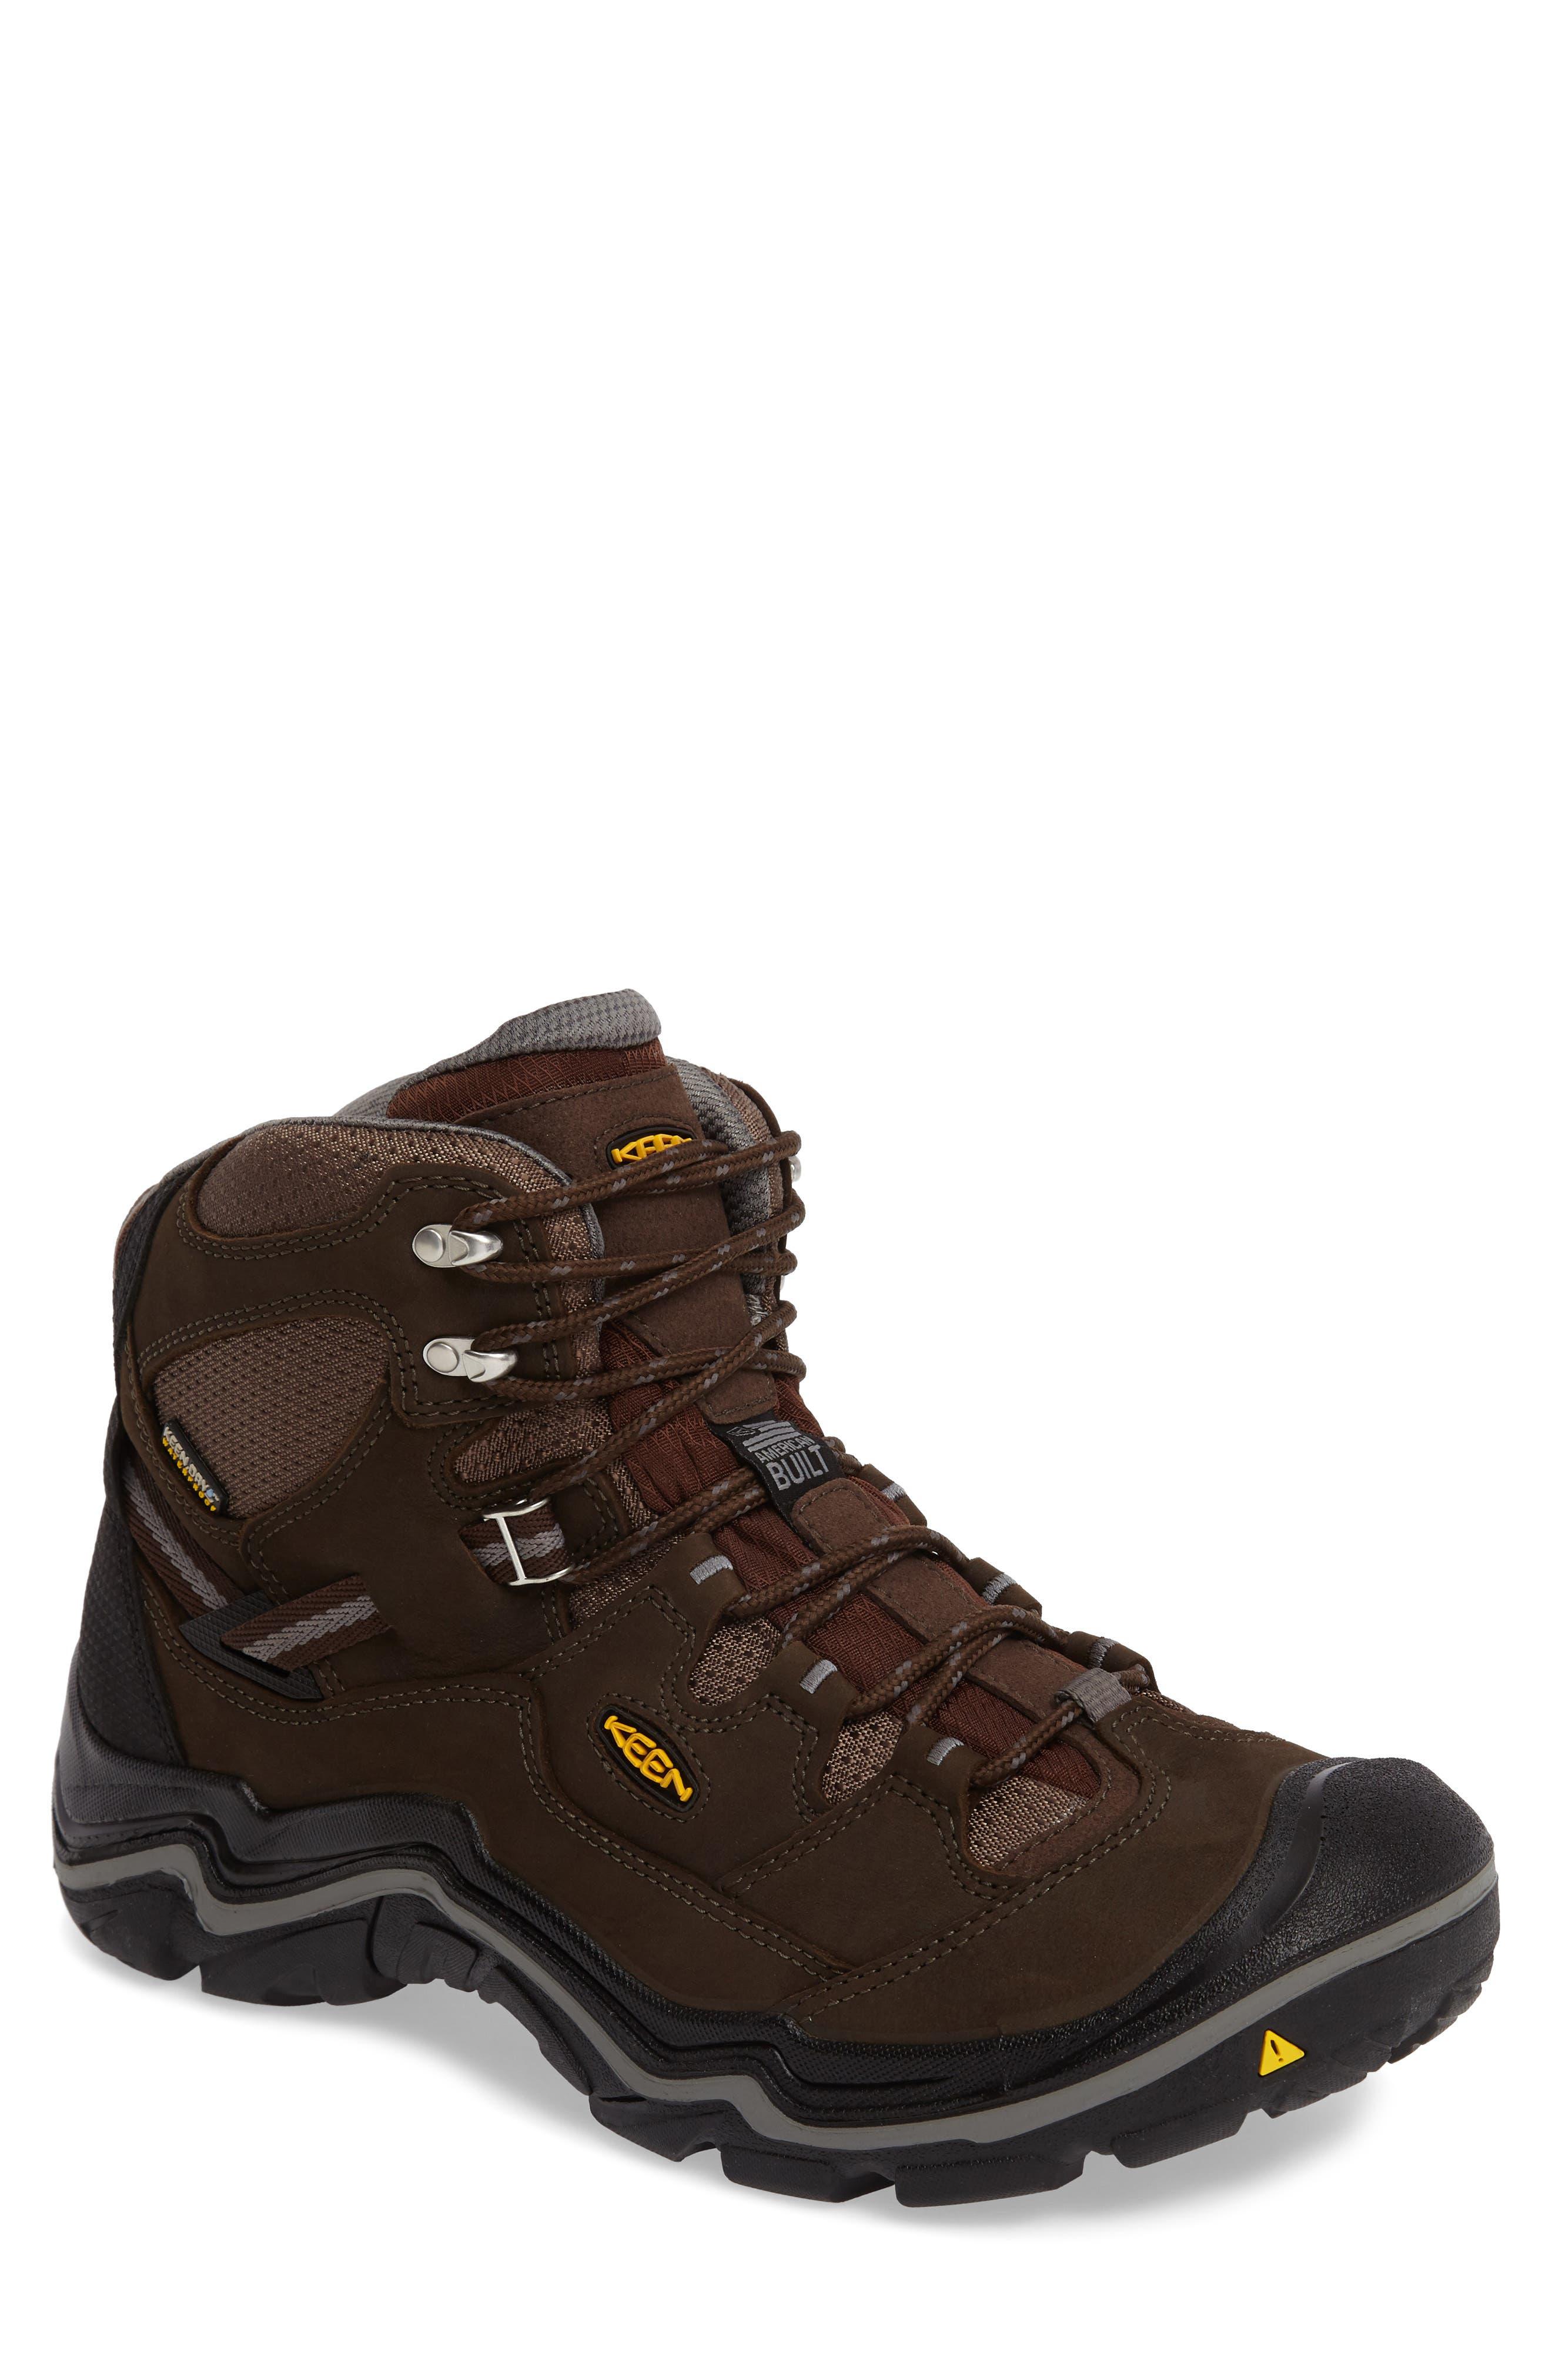 Durand Mid Waterproof Hiking Boot,                             Main thumbnail 1, color,                             211